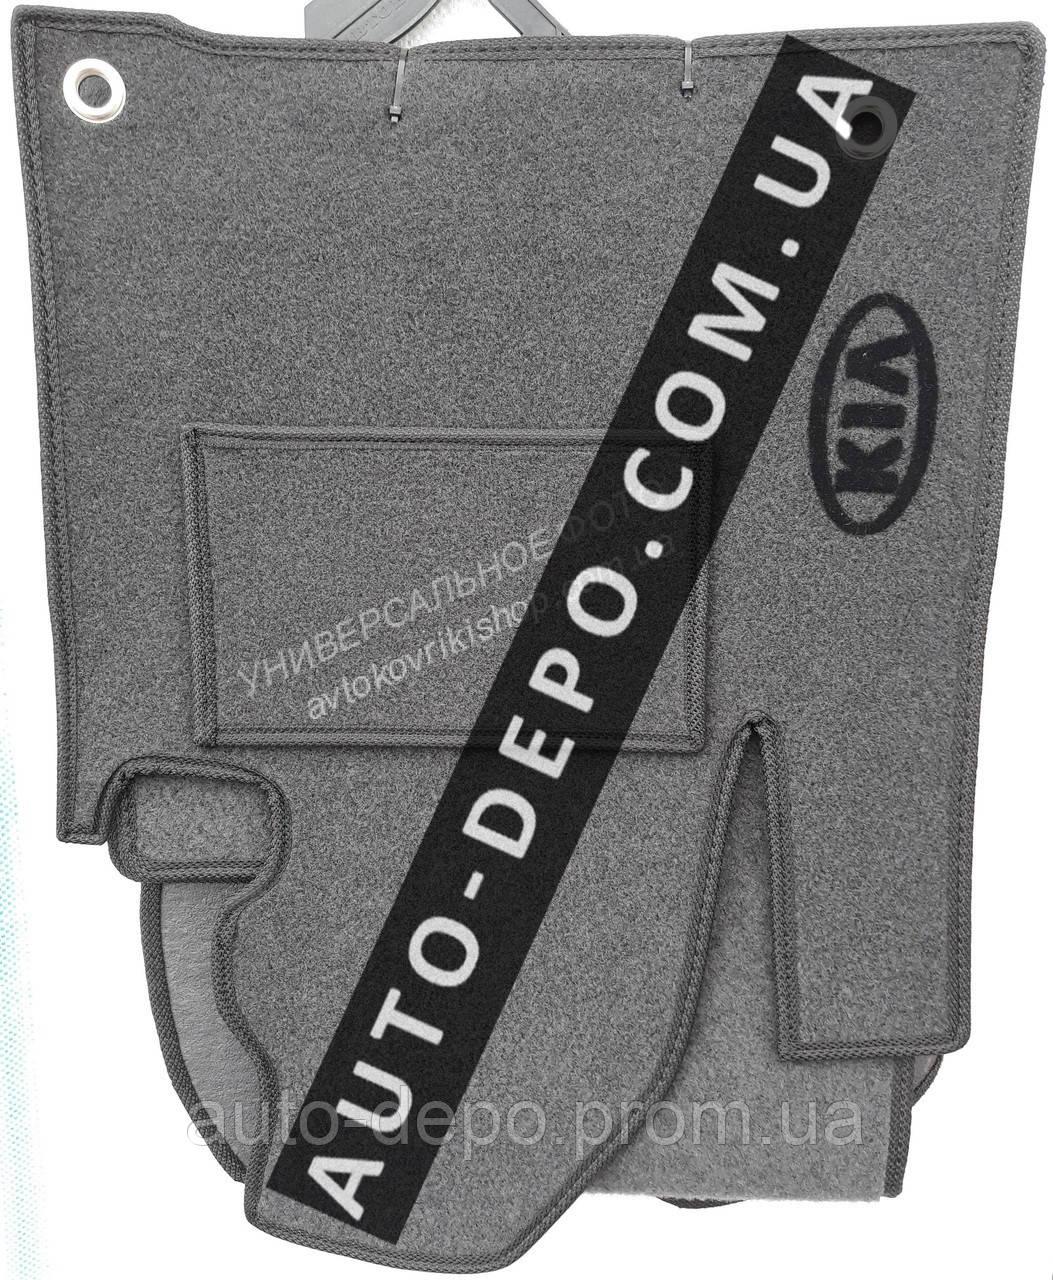 Ворсовые коврики Kia Venga 2010- VIP ЛЮКС АВТО-ВОРС